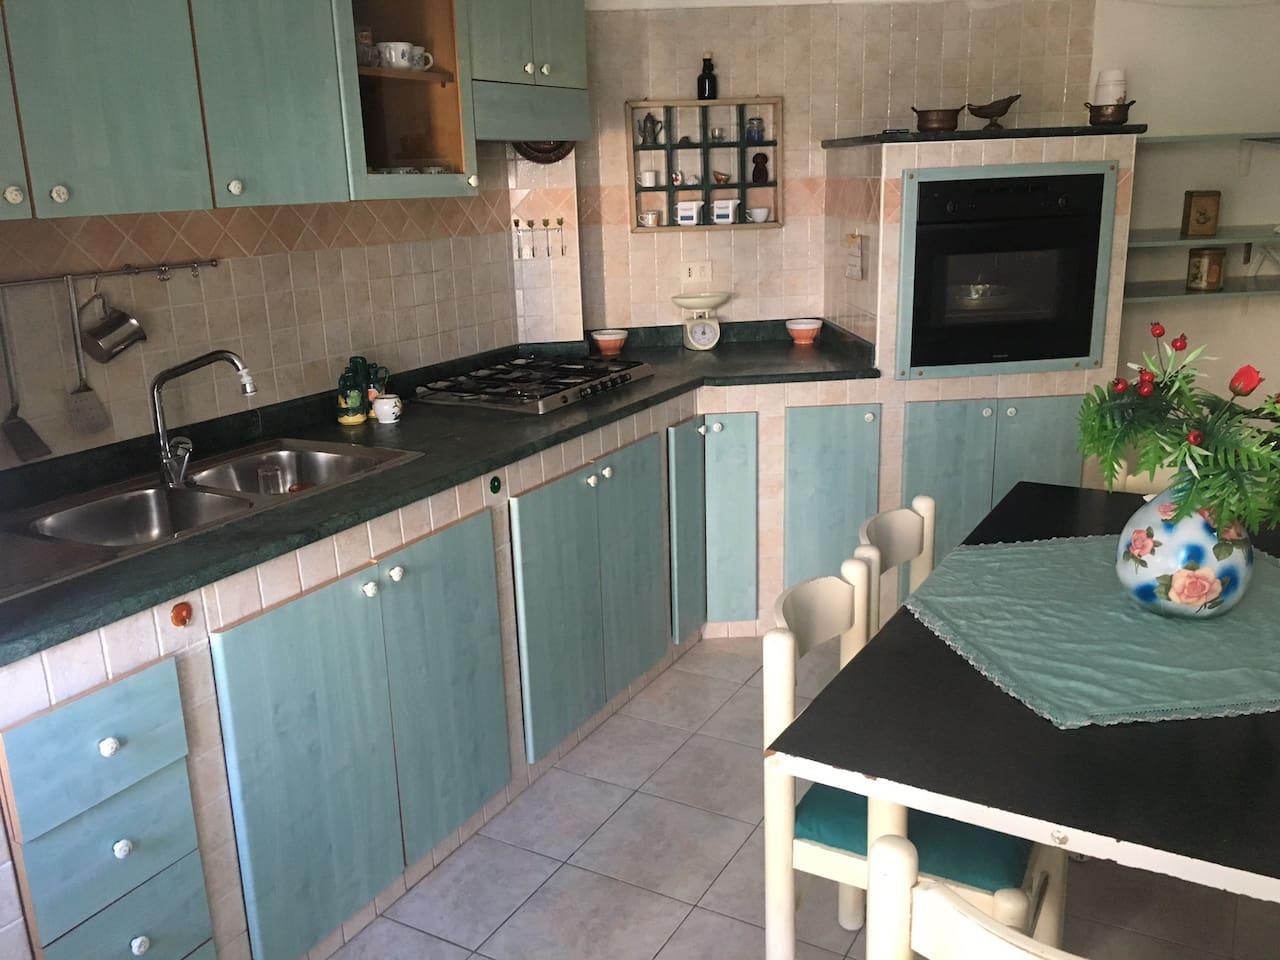 Forno Cucina In Muratura casa di charlie - apartments for rent in gaeta